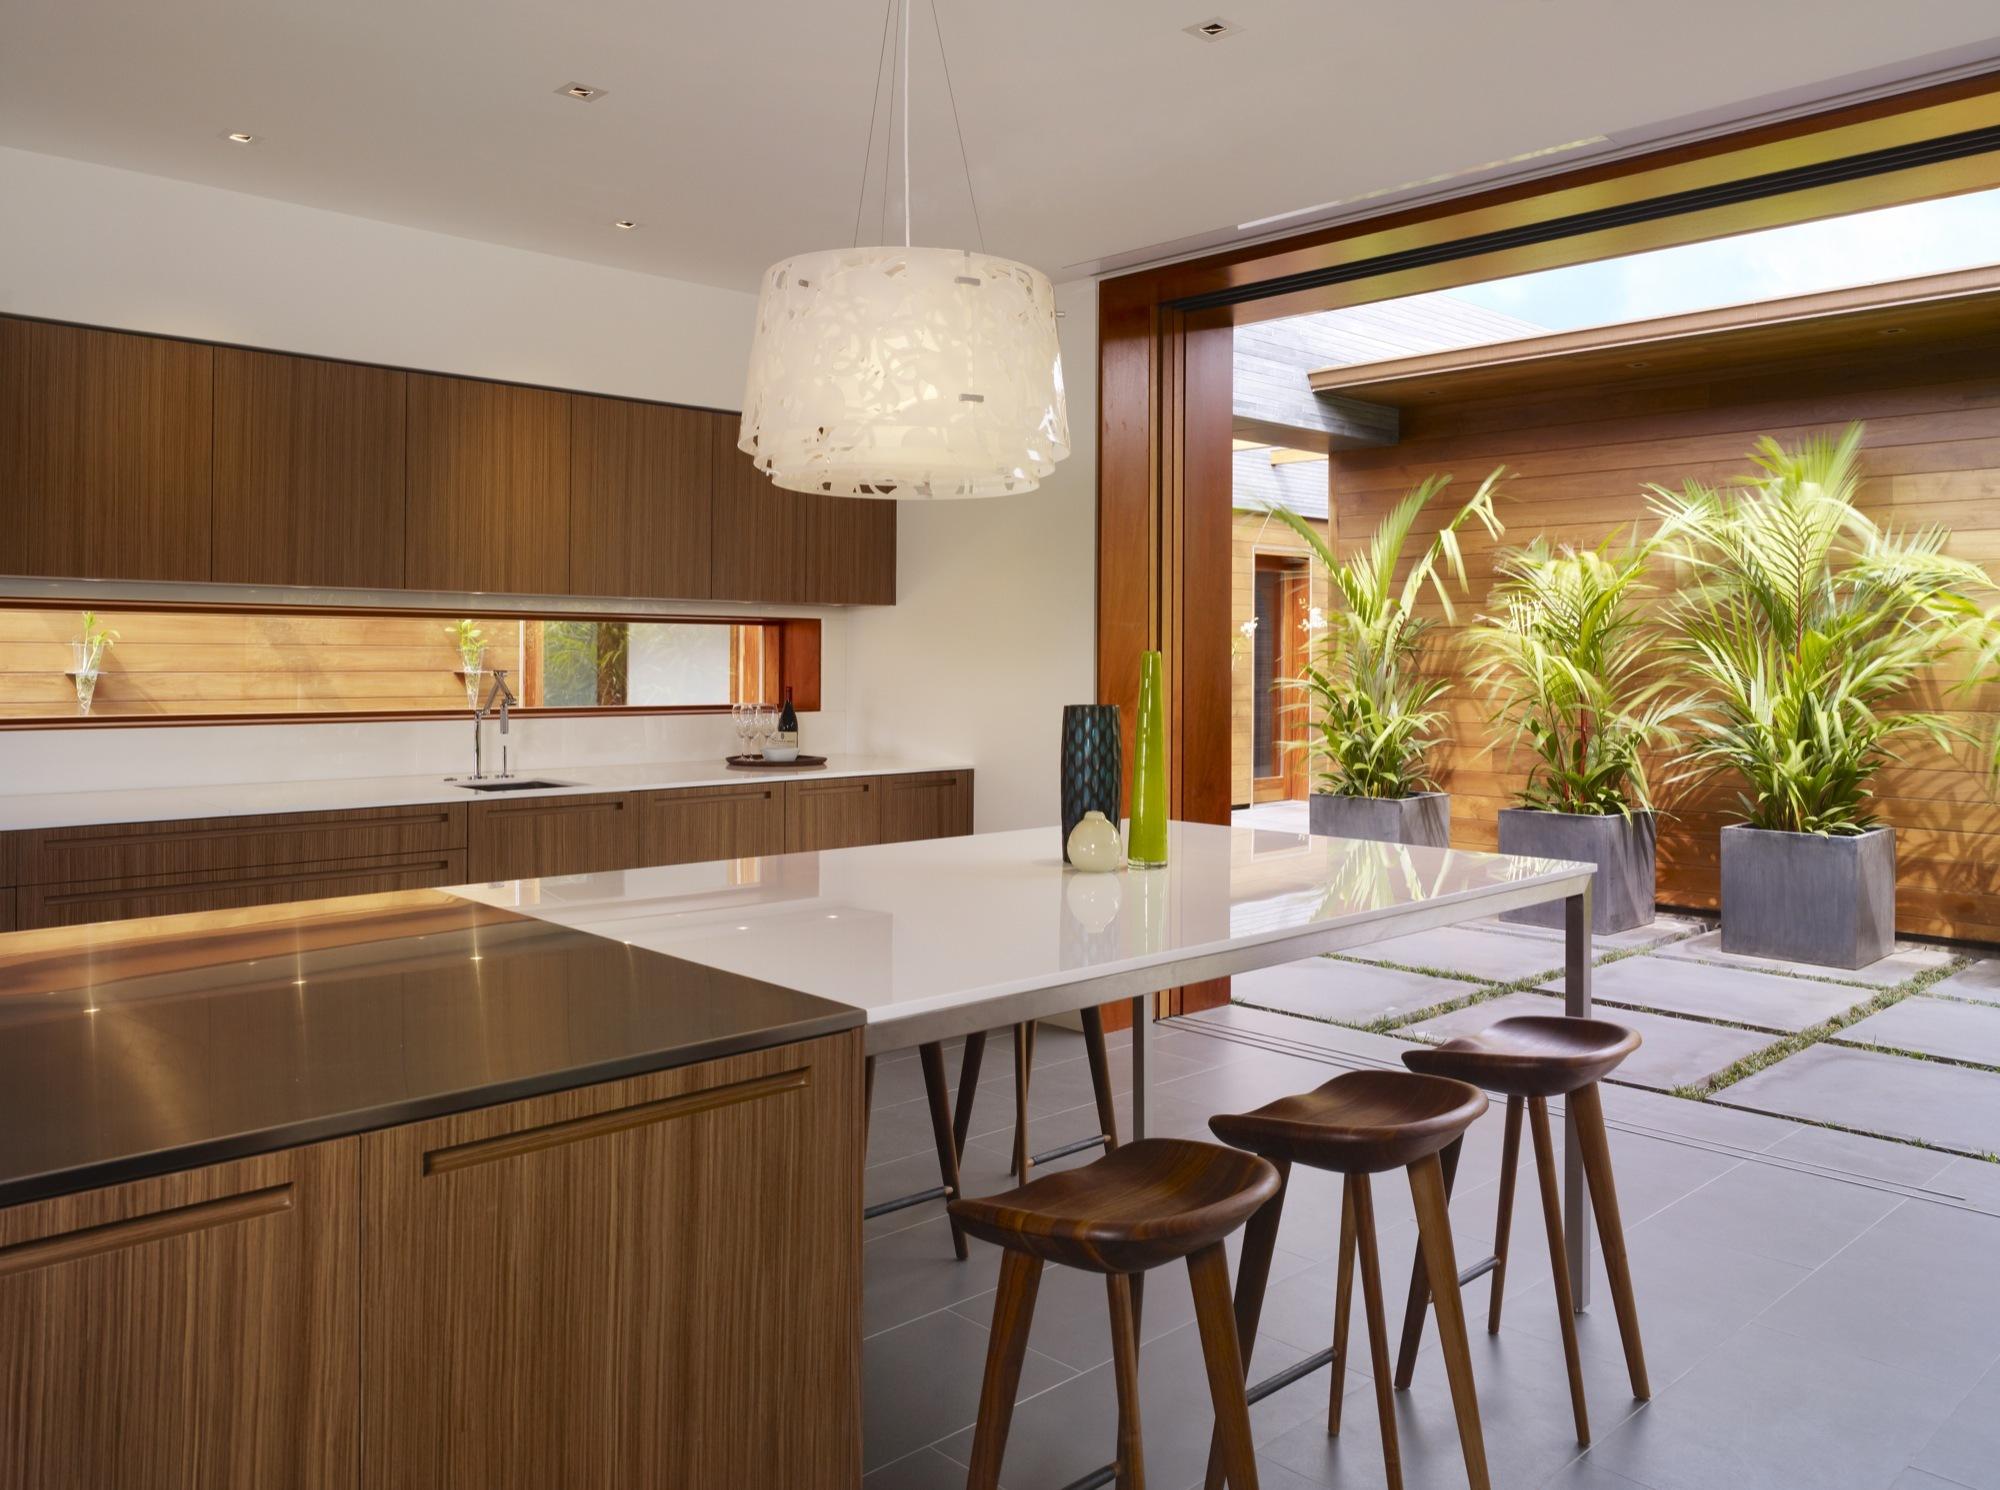 Kona Residence, Belzberg Arquitects, Hawaï, Cuisine